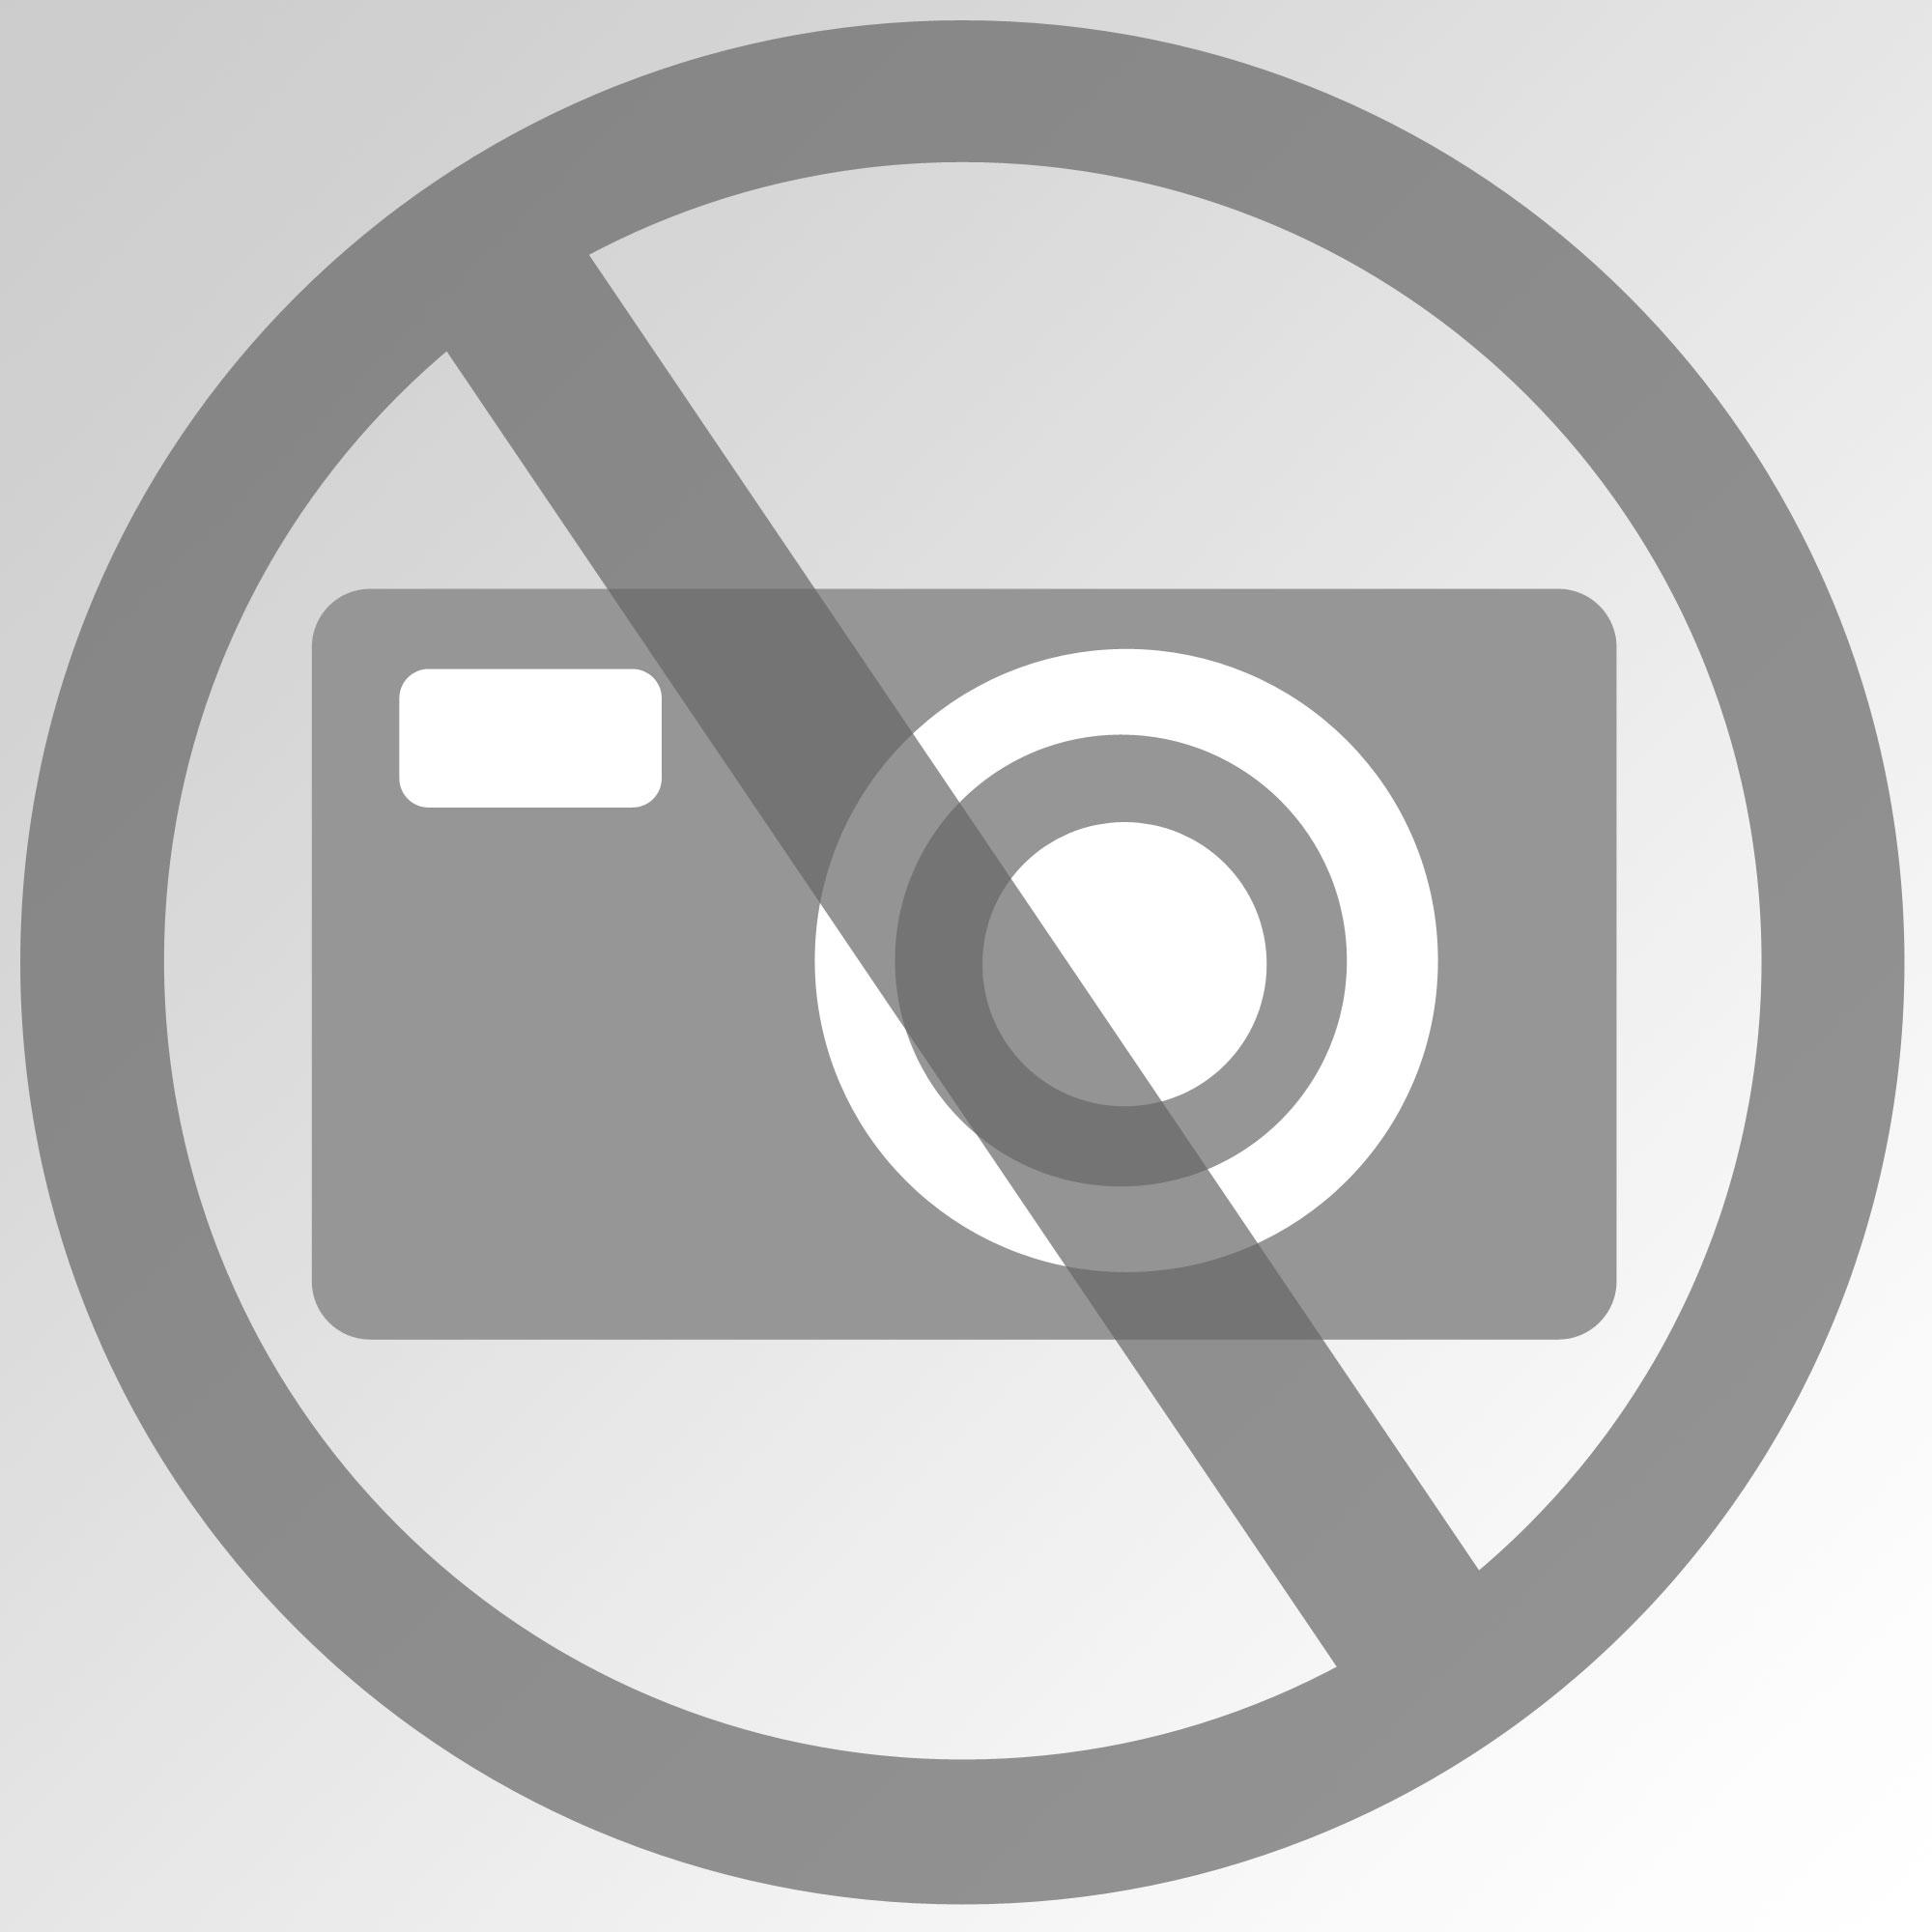 Kleen Purgatis Budesin U - 7,5% ig 1 Ltr. Desinfektionsmittel